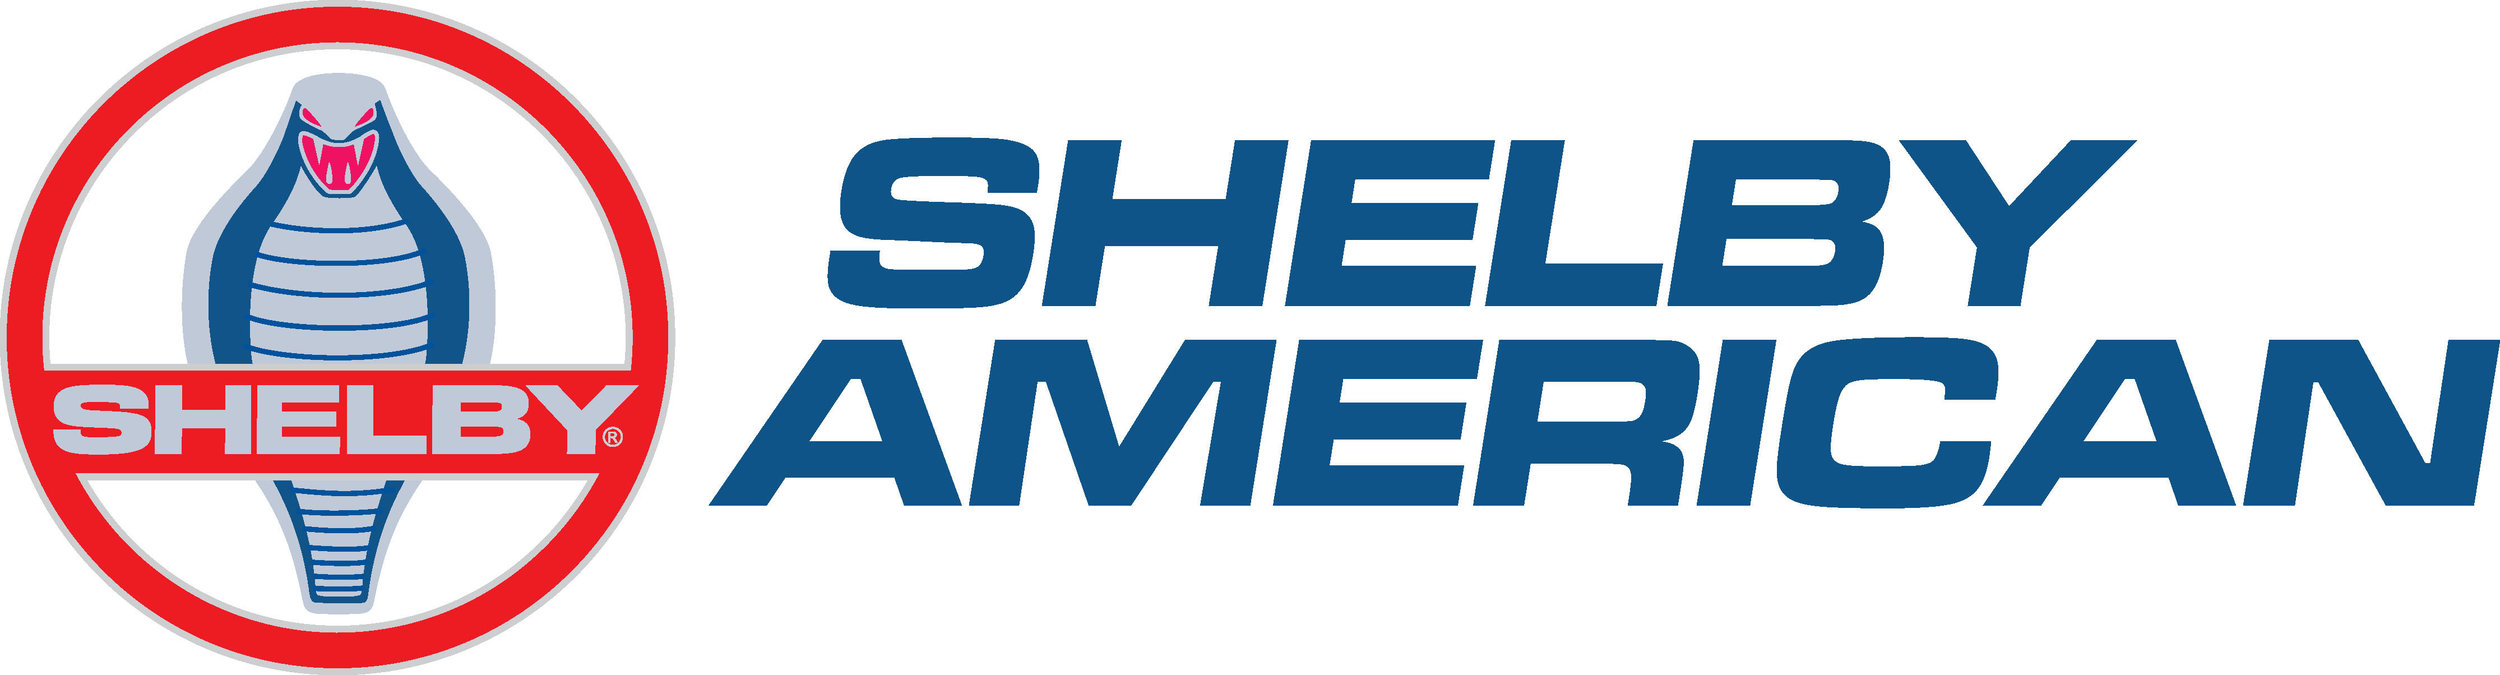 Shelby American logo